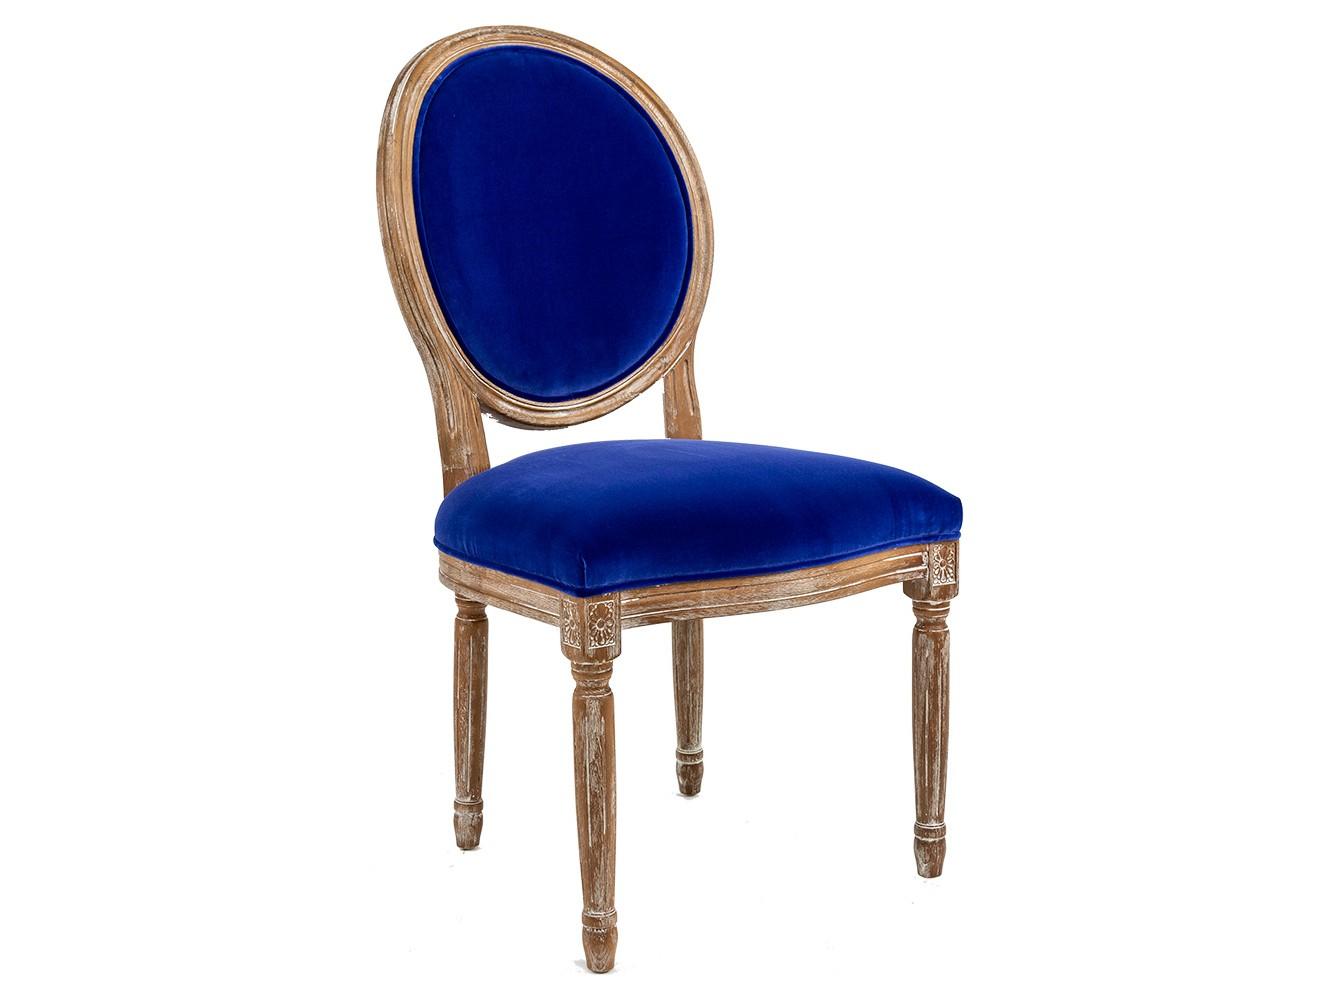 Кухонный стул Object Desire 15438295 от thefurnish